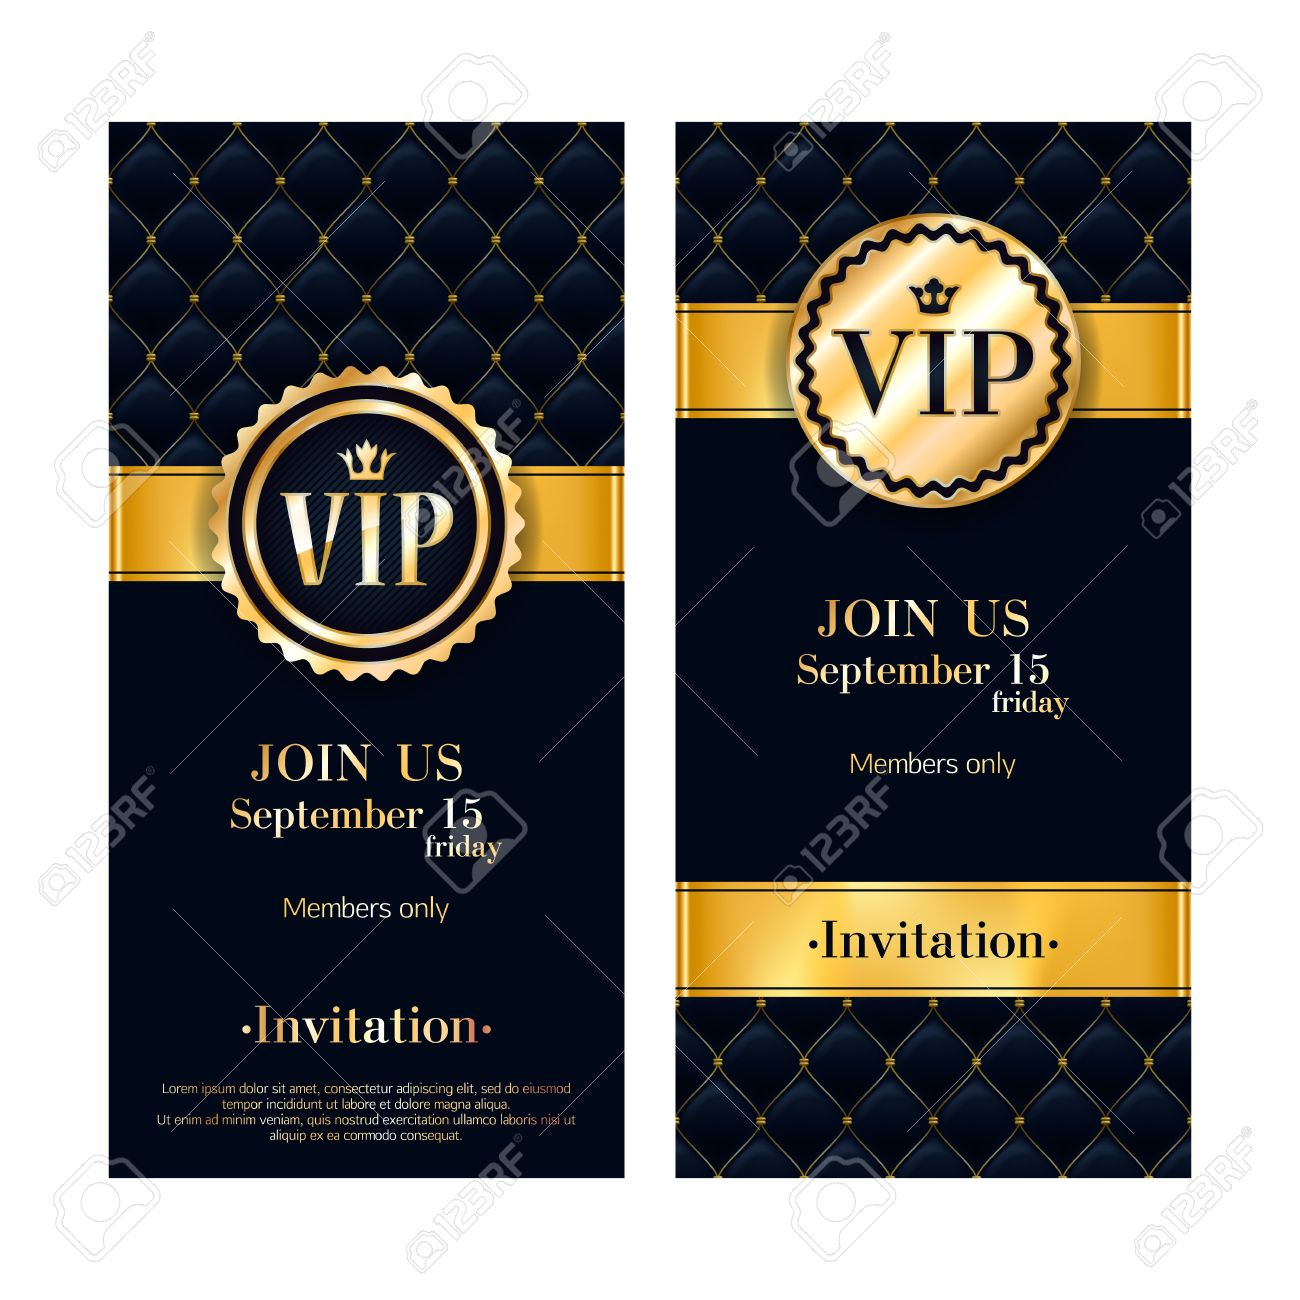 Vip party premium invitation card poster black and golden design 63174582 vip party premium invitation card poster black and golden design template quilted pattern decorativeg stopboris Gallery